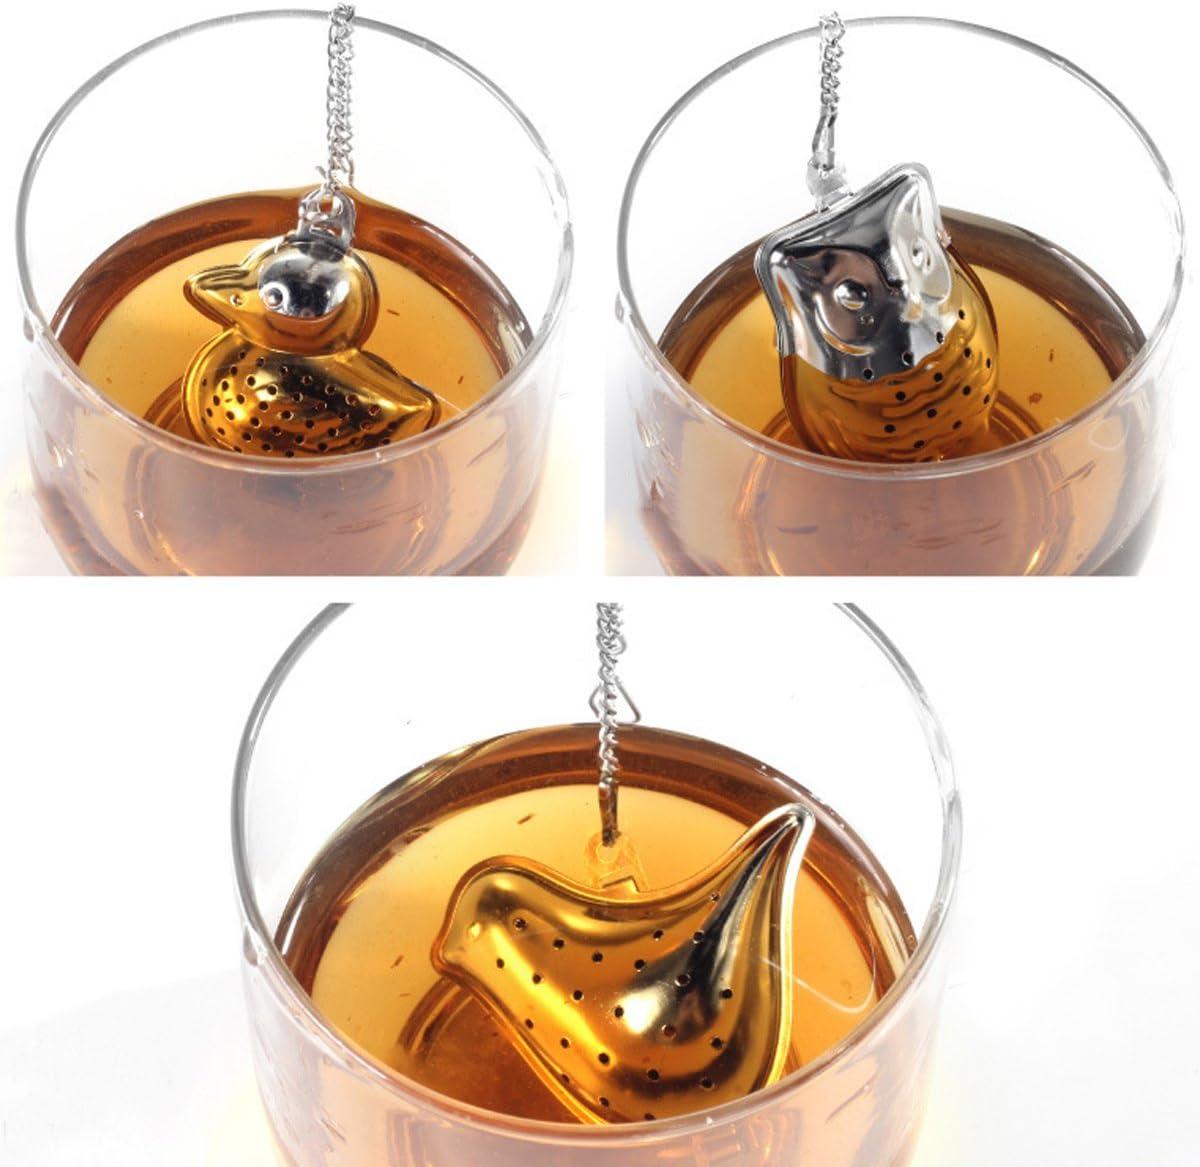 Milya 3 St/ück Set 304 Edelstahl Tee-Ei Teesieb Teekugel Teefilter Filter Tee Werkzeuge Tee Leckage Blume Tee Filter Set mit Mini Kleiner Teller Tier-Serie